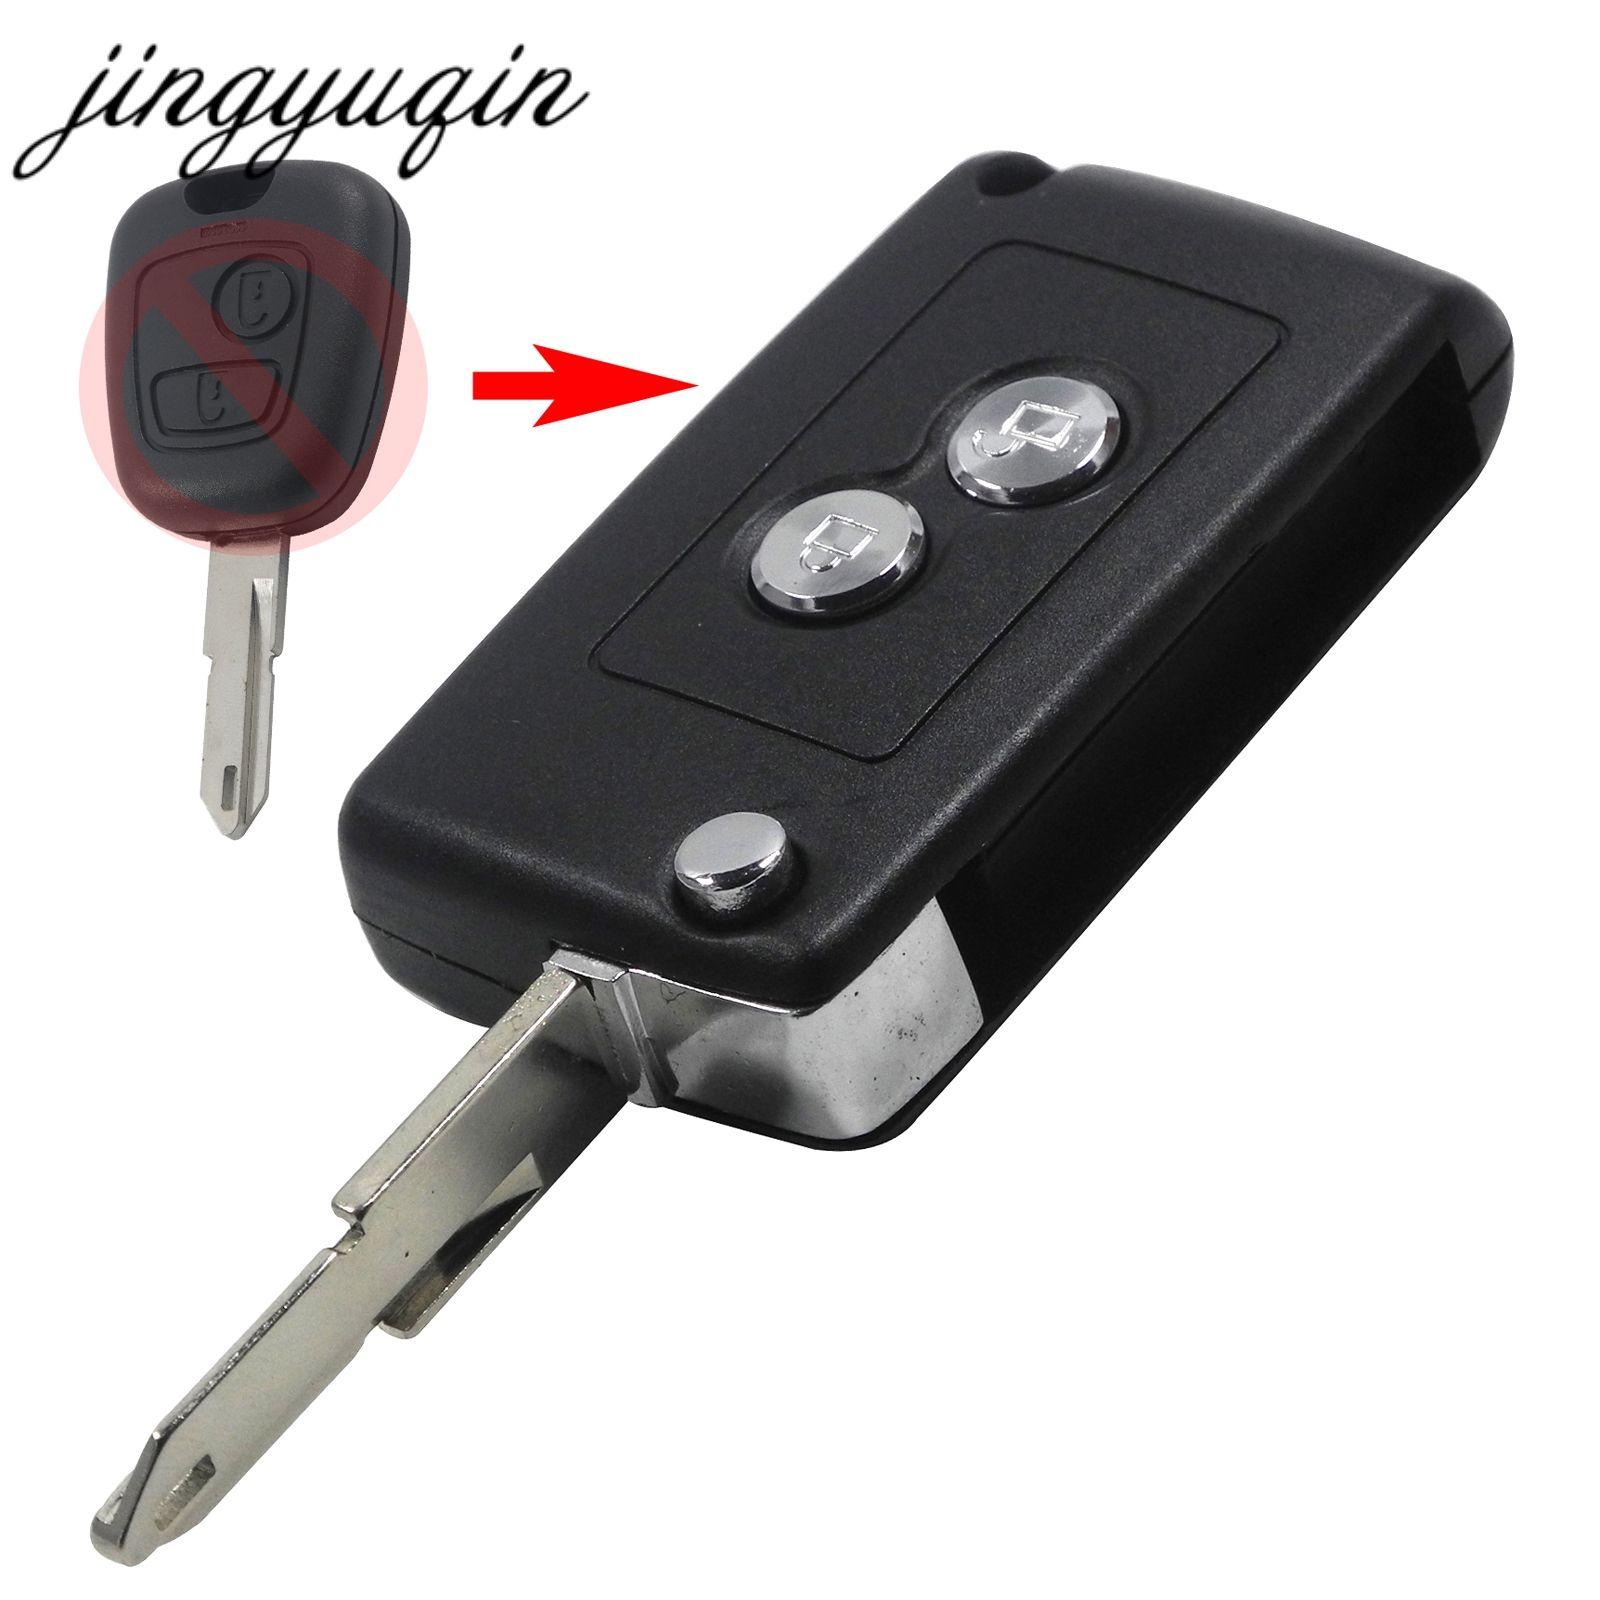 Jingyuqin Geändert 2 Tasten Flip Folding Auto Schlüssel Shell fob für Citroen C2 C3 Xsara Picasso Fernbedienung Auto Schlüssel Fall ersatz